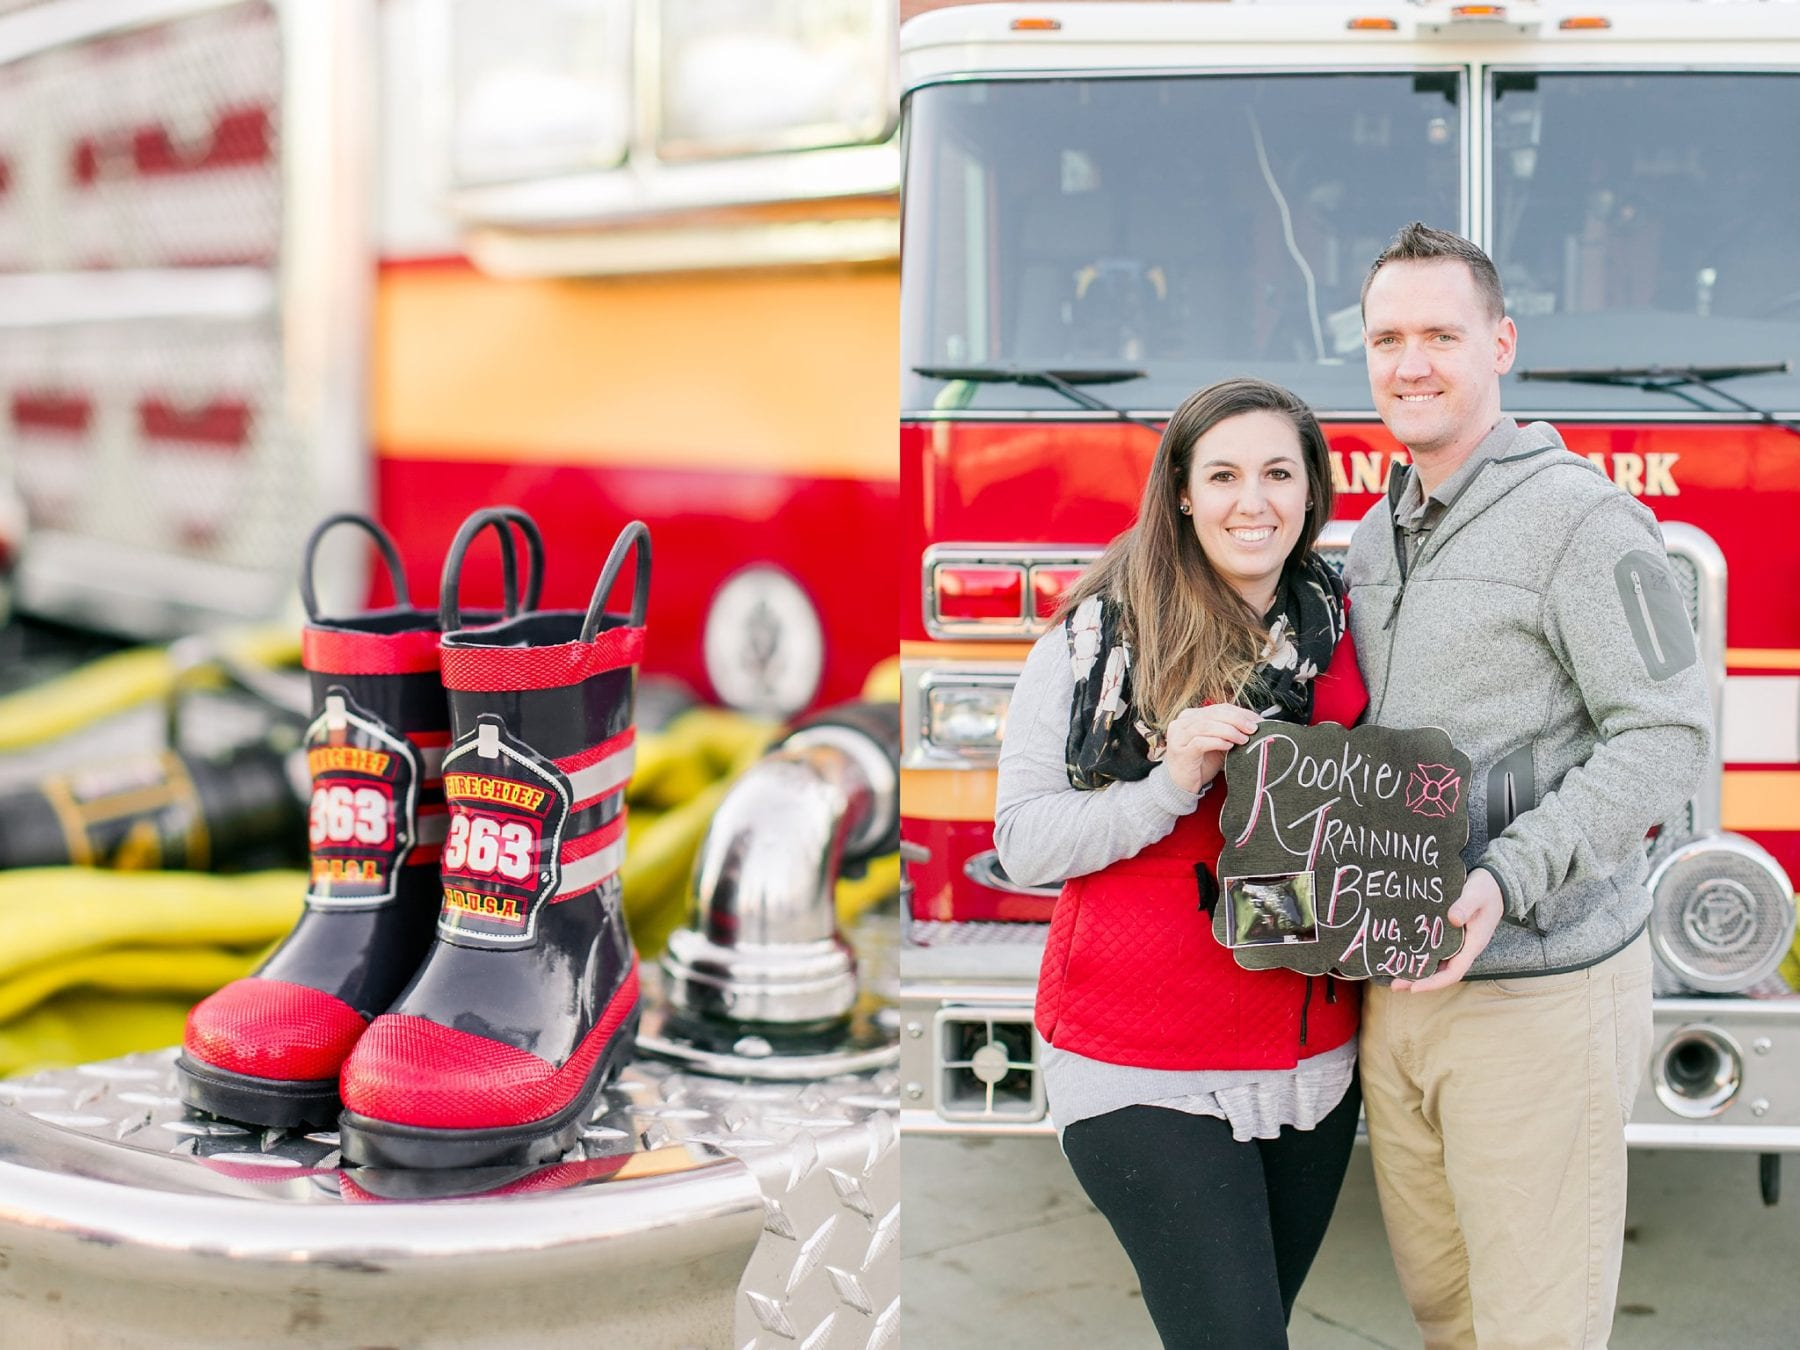 Firefighter Baby Announcement Virginia Photographer Megan Kelsey Photography Jeromy & Becky-6.jpg